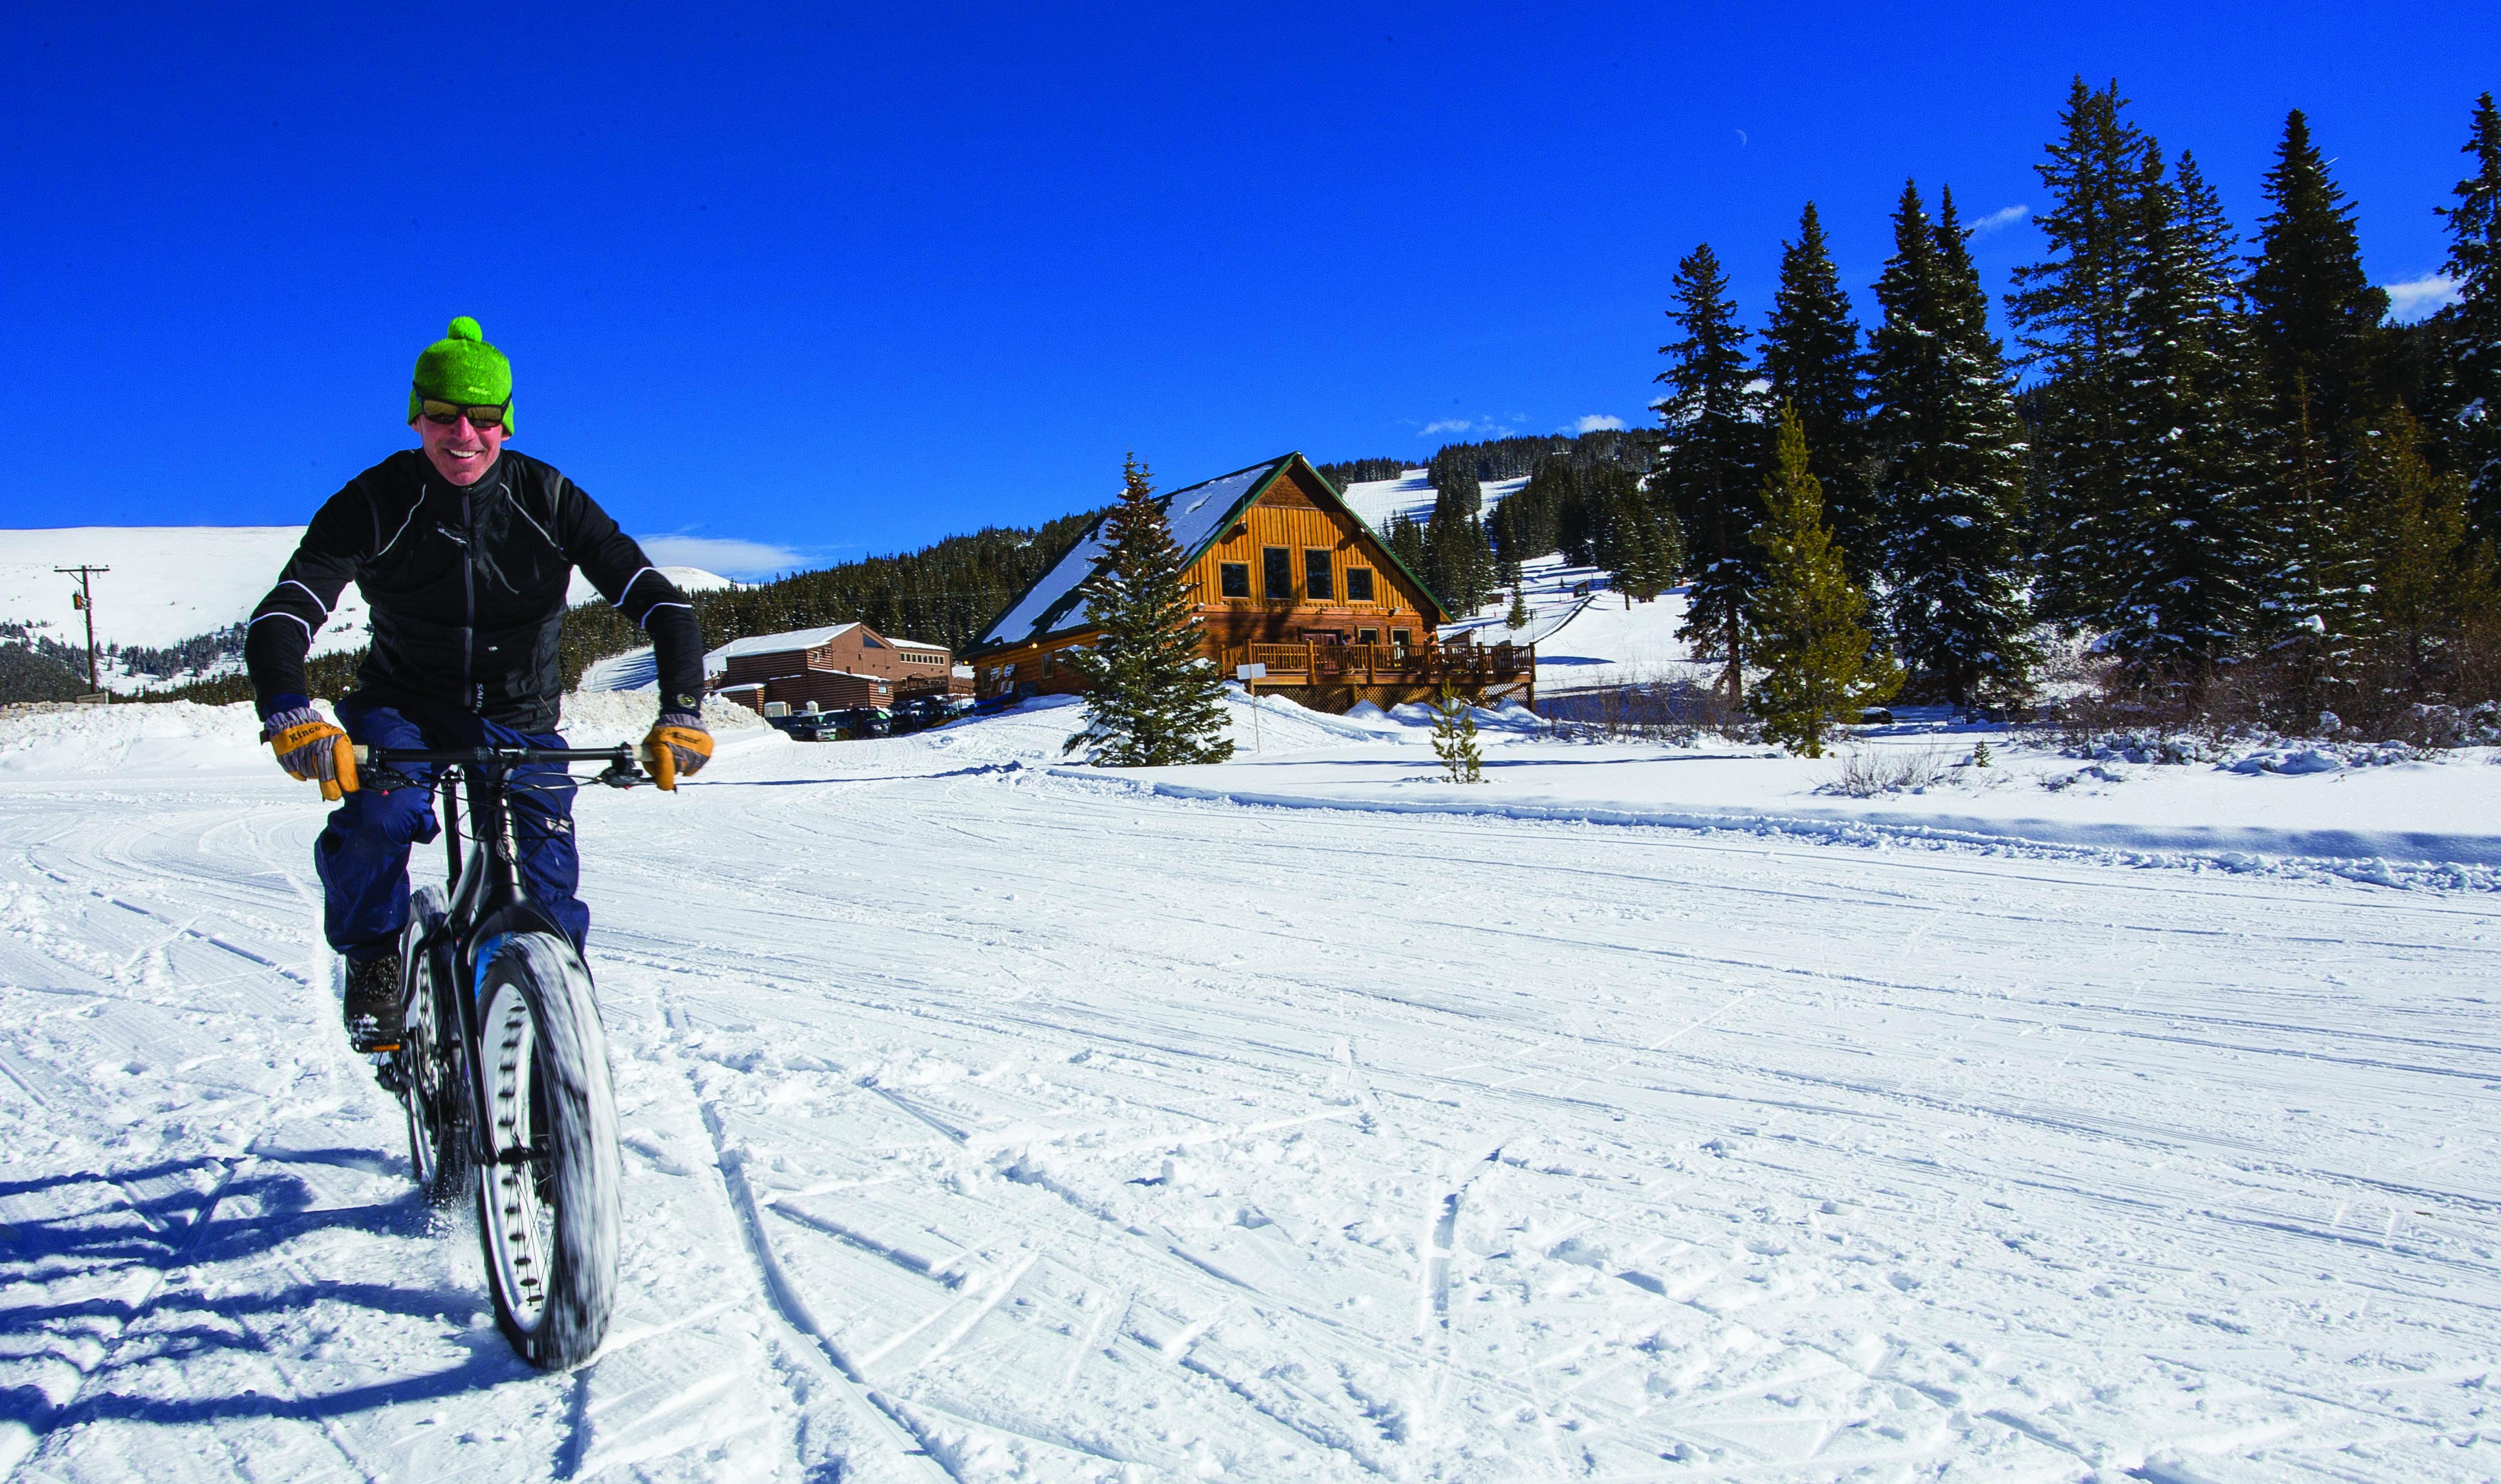 fat bike bliss - elevation outdoors magazine